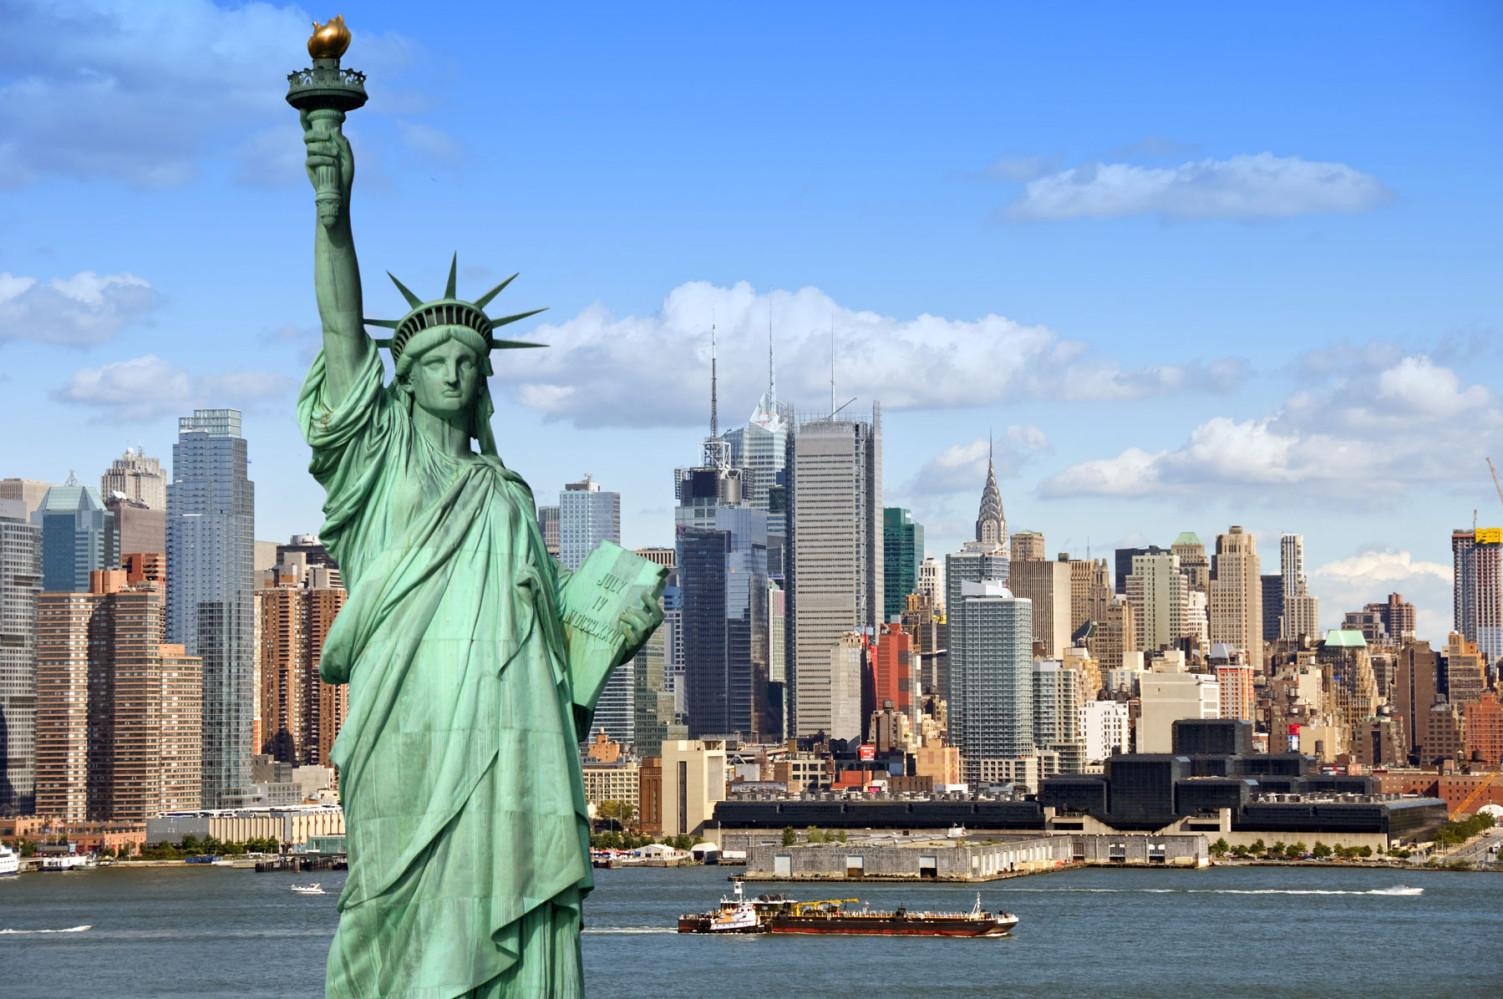 Statue of Liberty, America